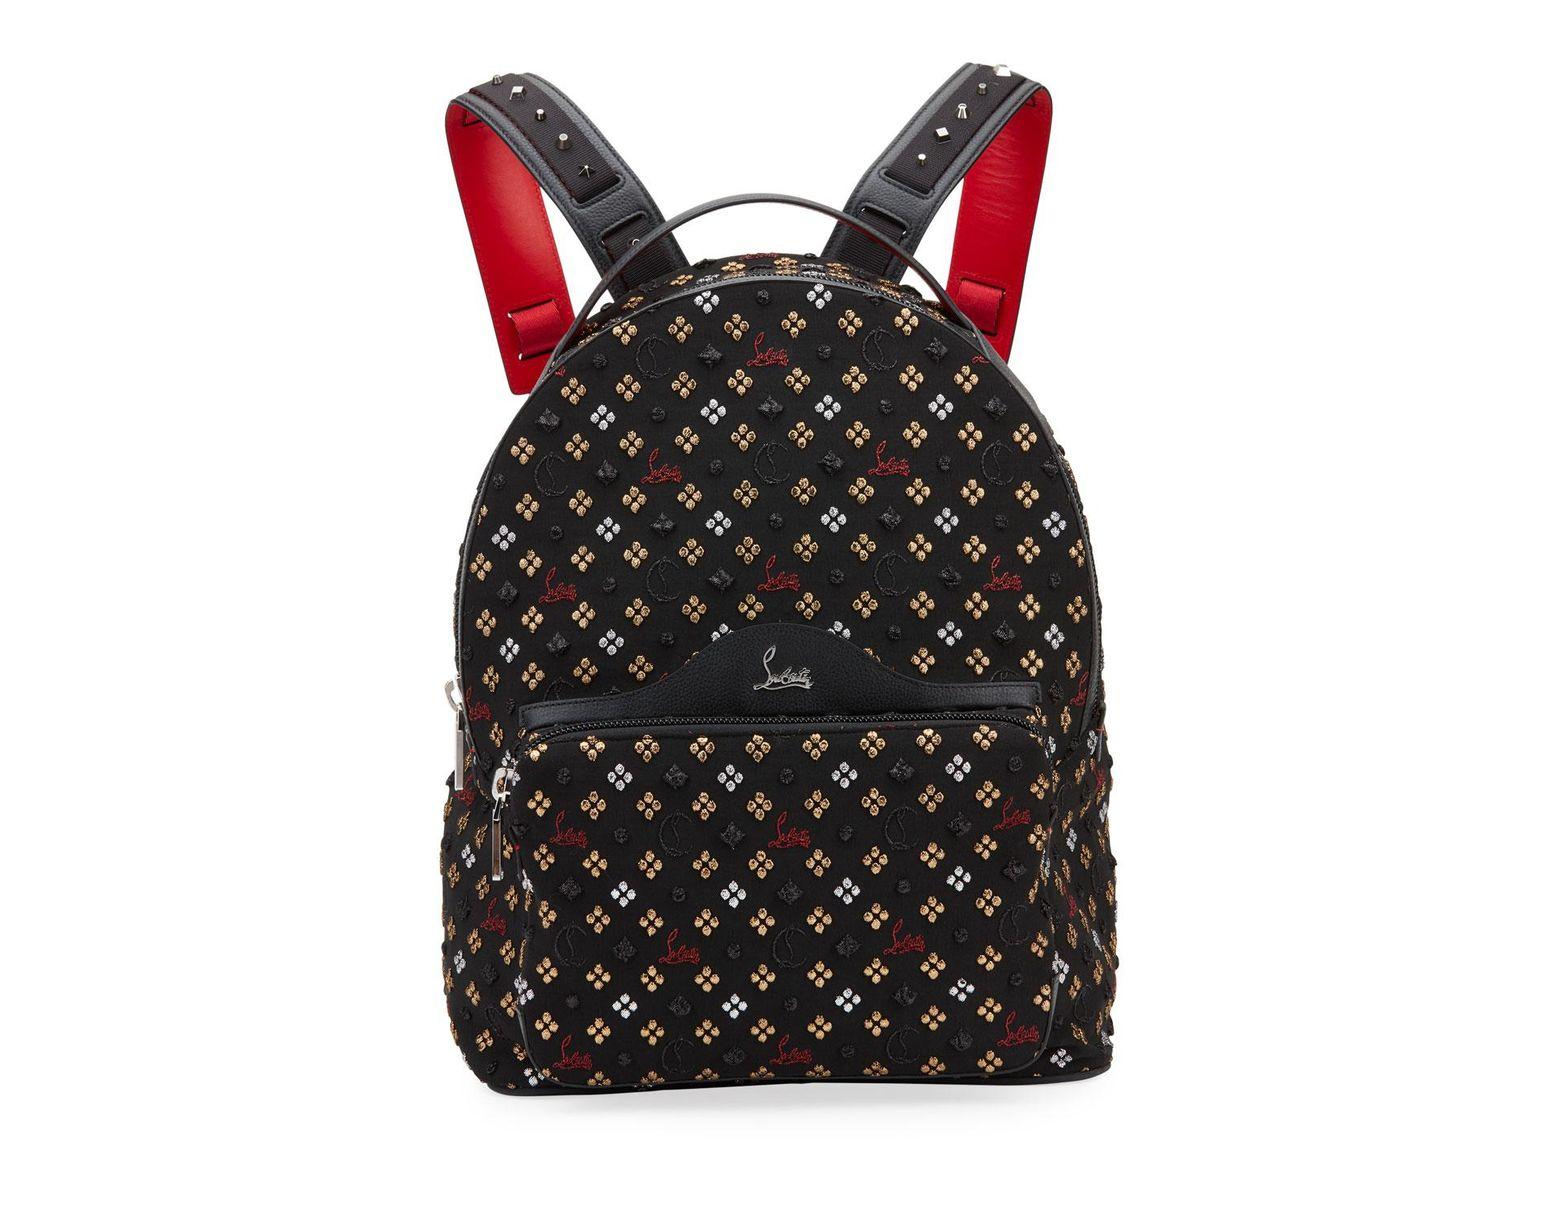 7844df78ce4 Men's Backloubi Jacquard Canvas Backpack